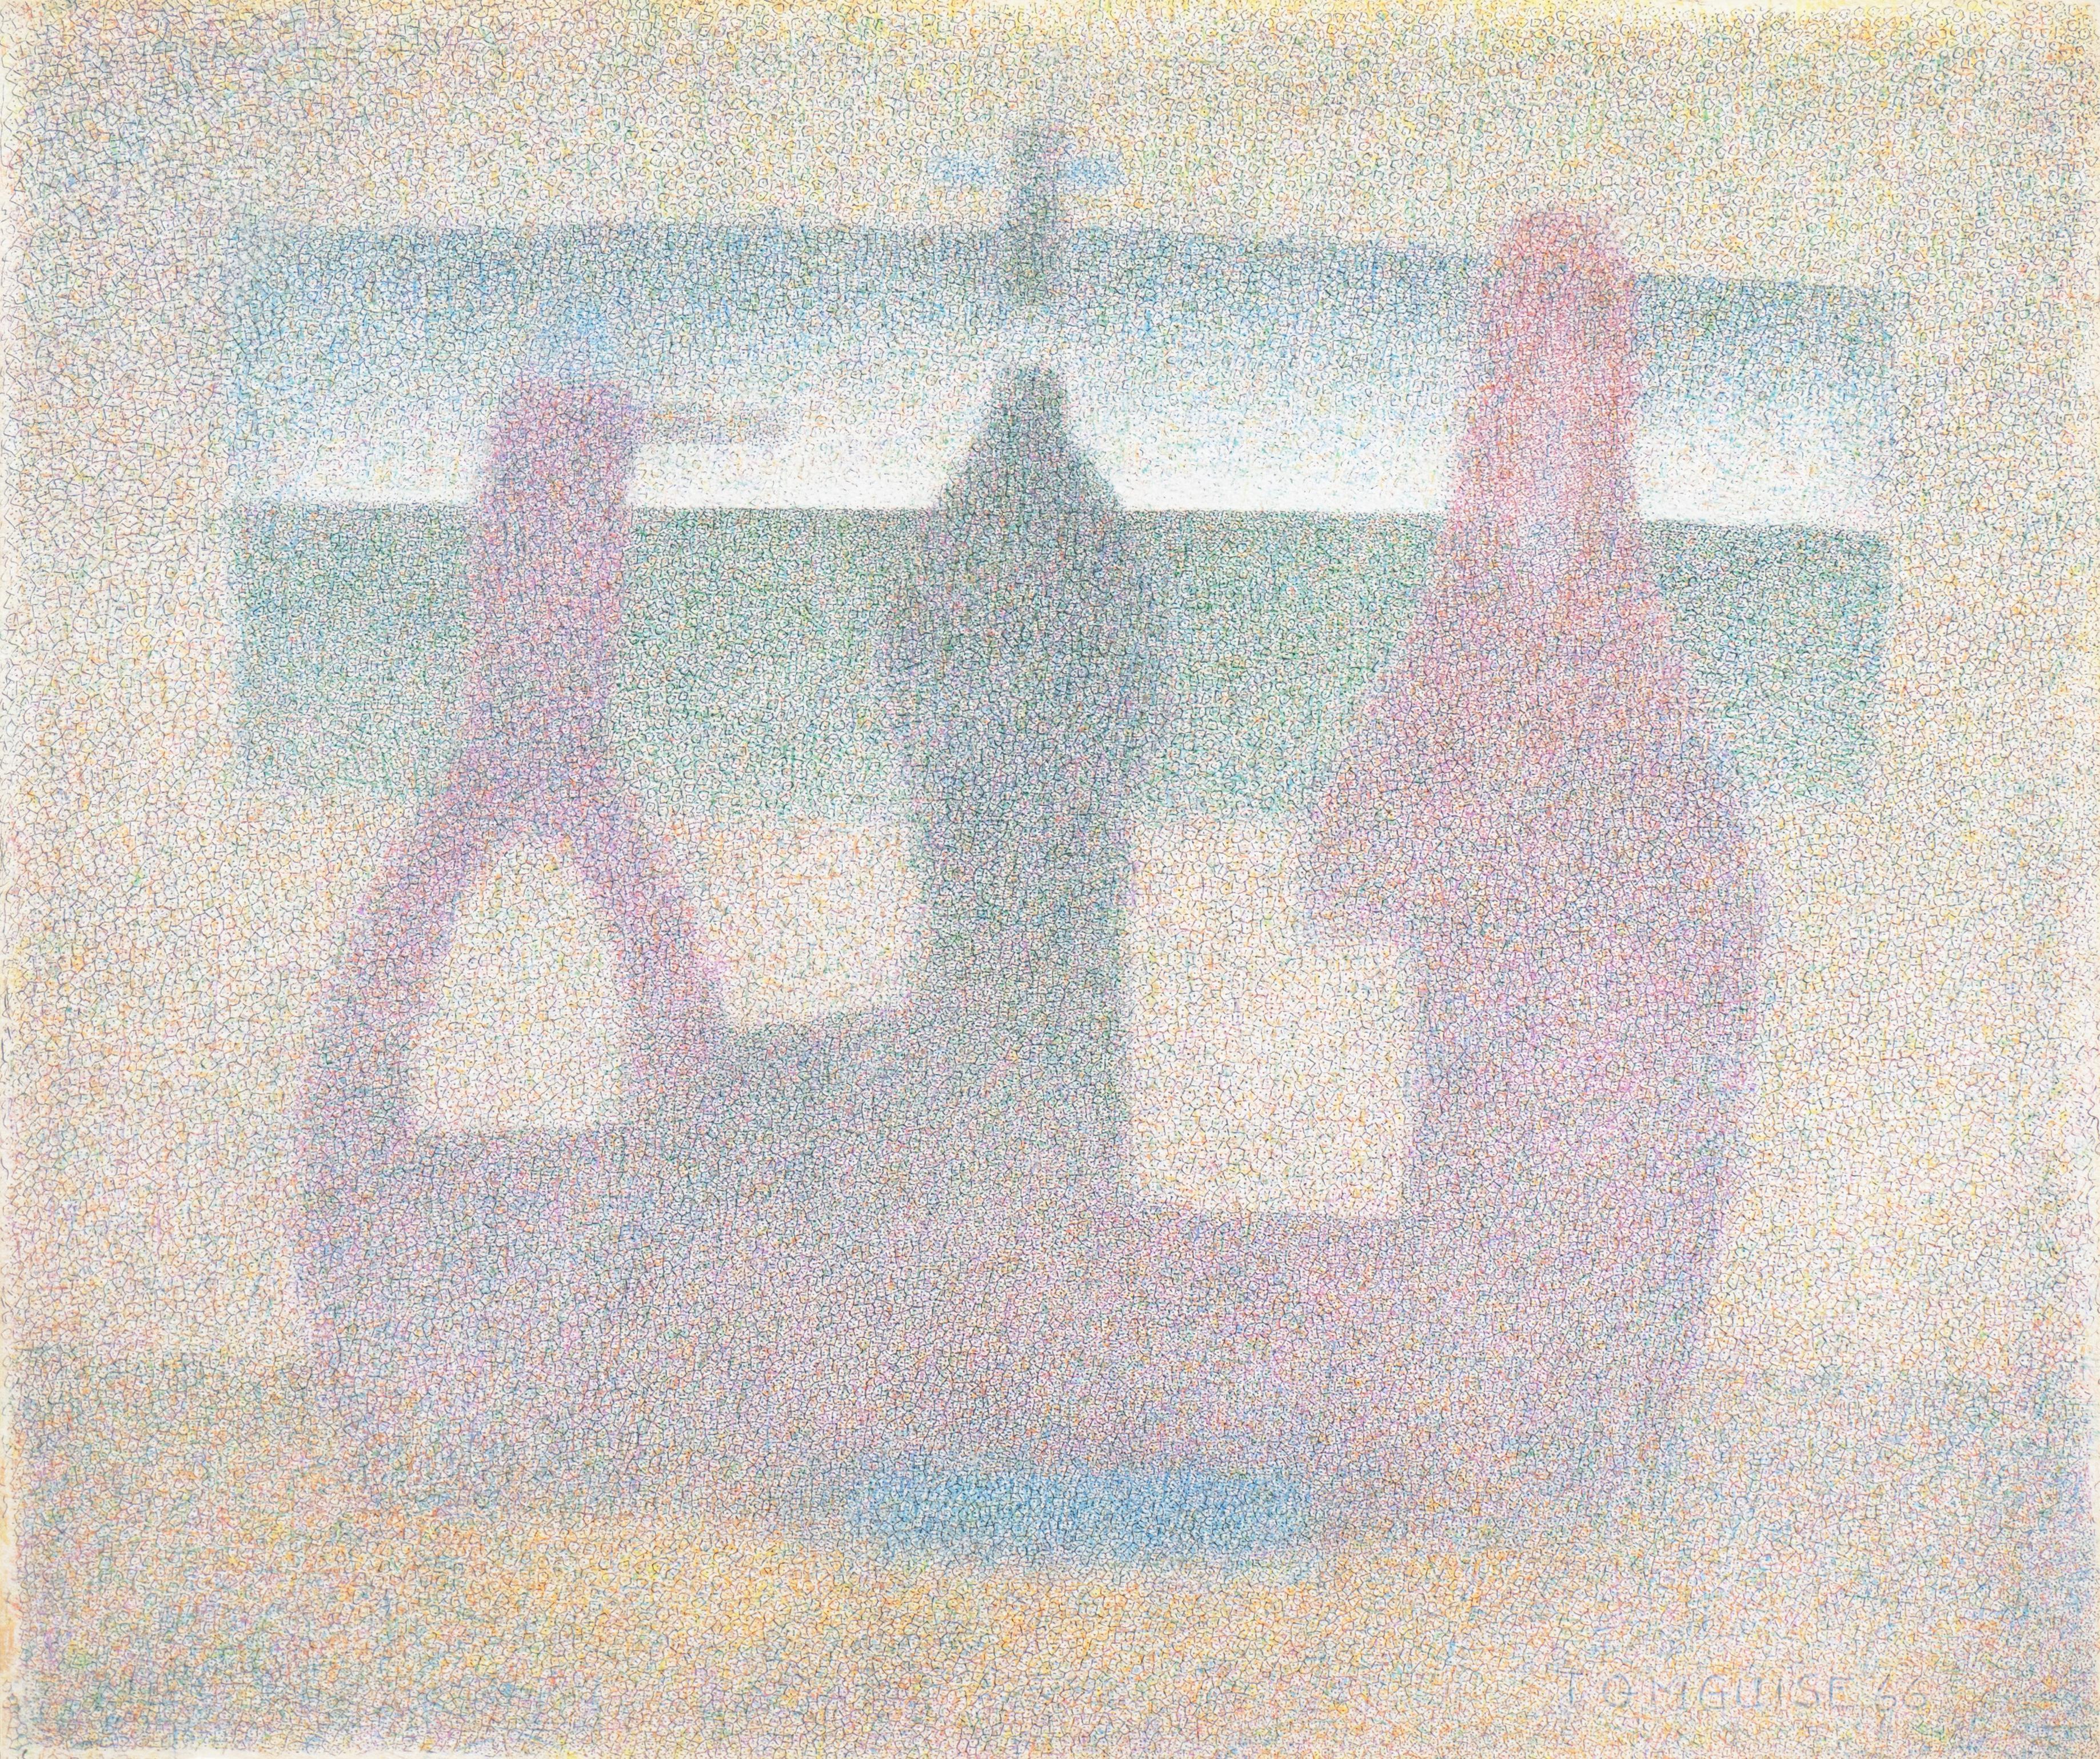 'Sand Castle', Palo Alto, Royal Society of Artists, Edinburgh Academy, RBA